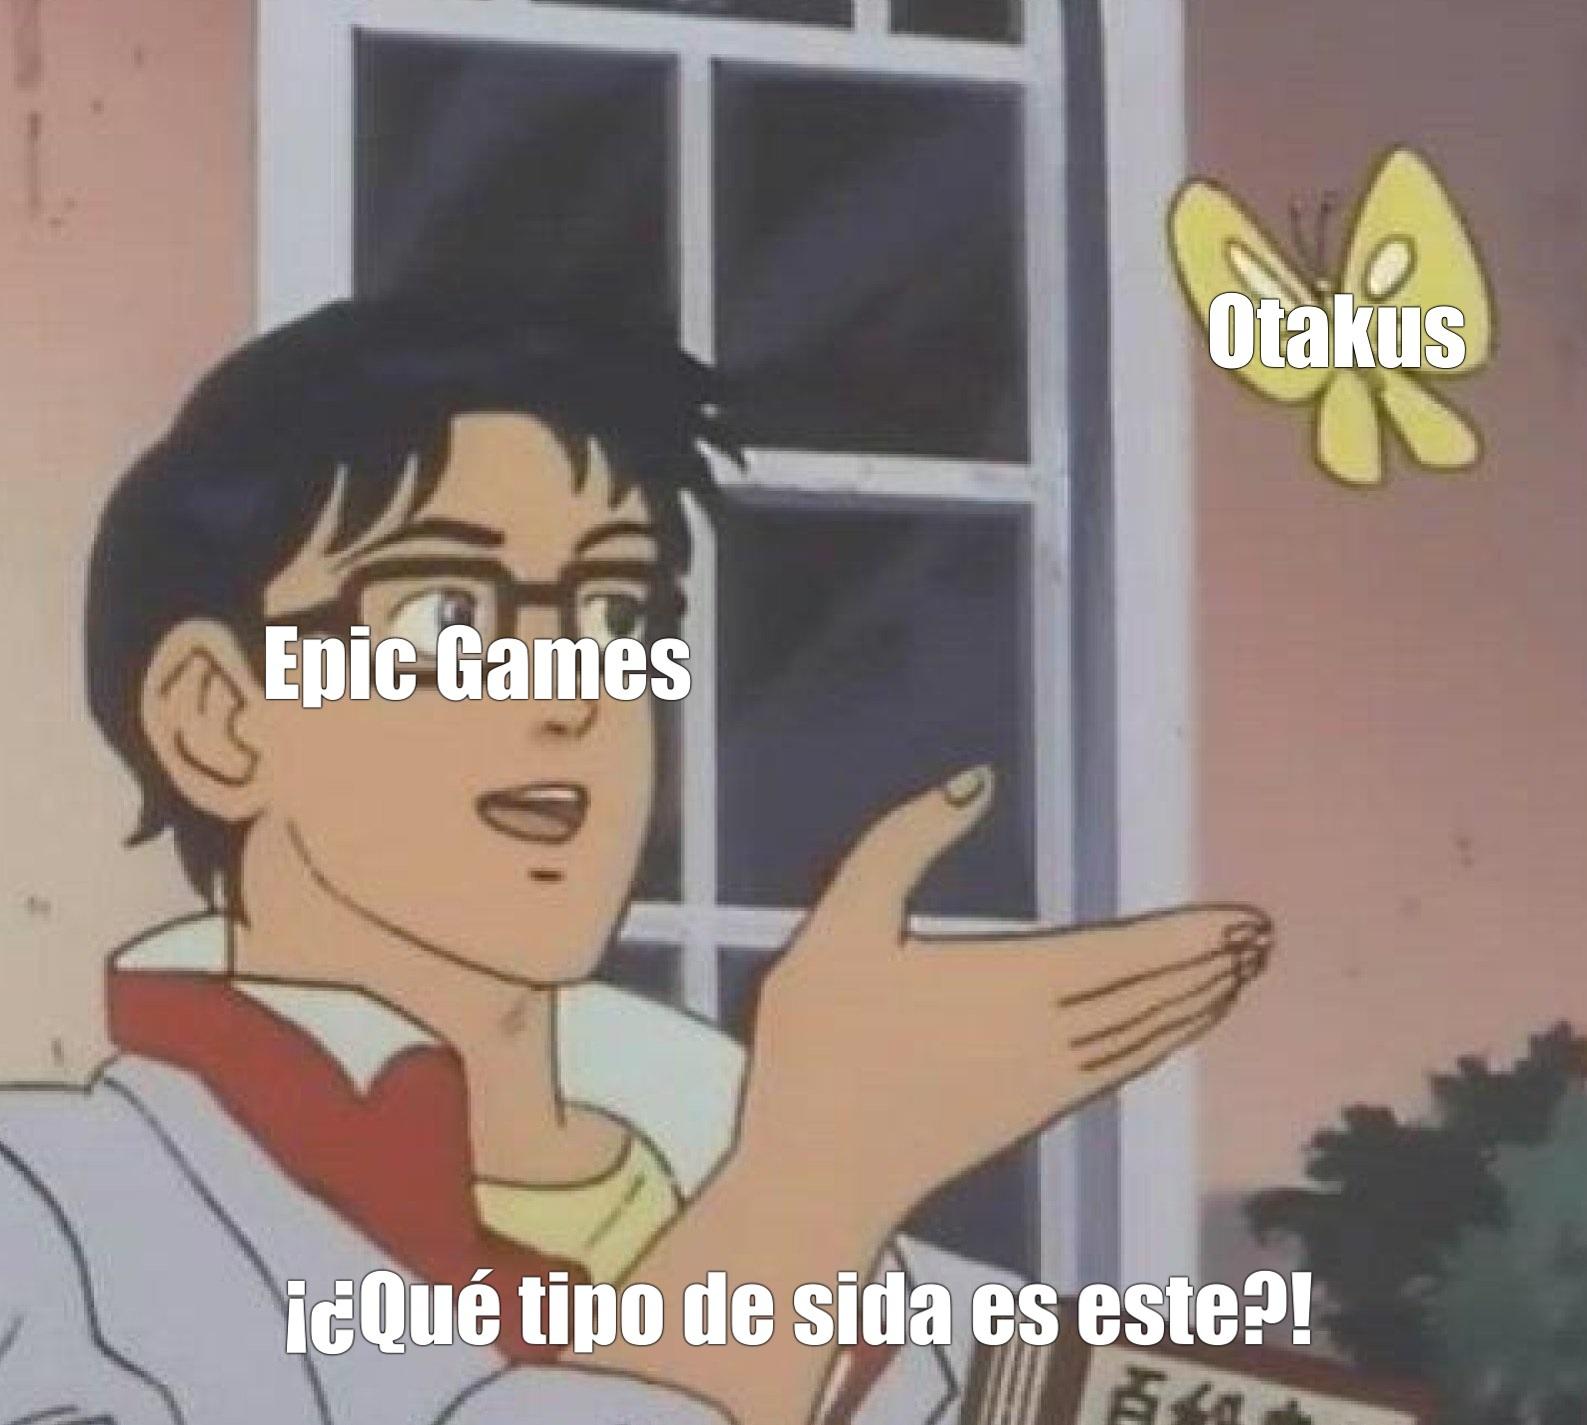 Malditos OTAKUS - meme